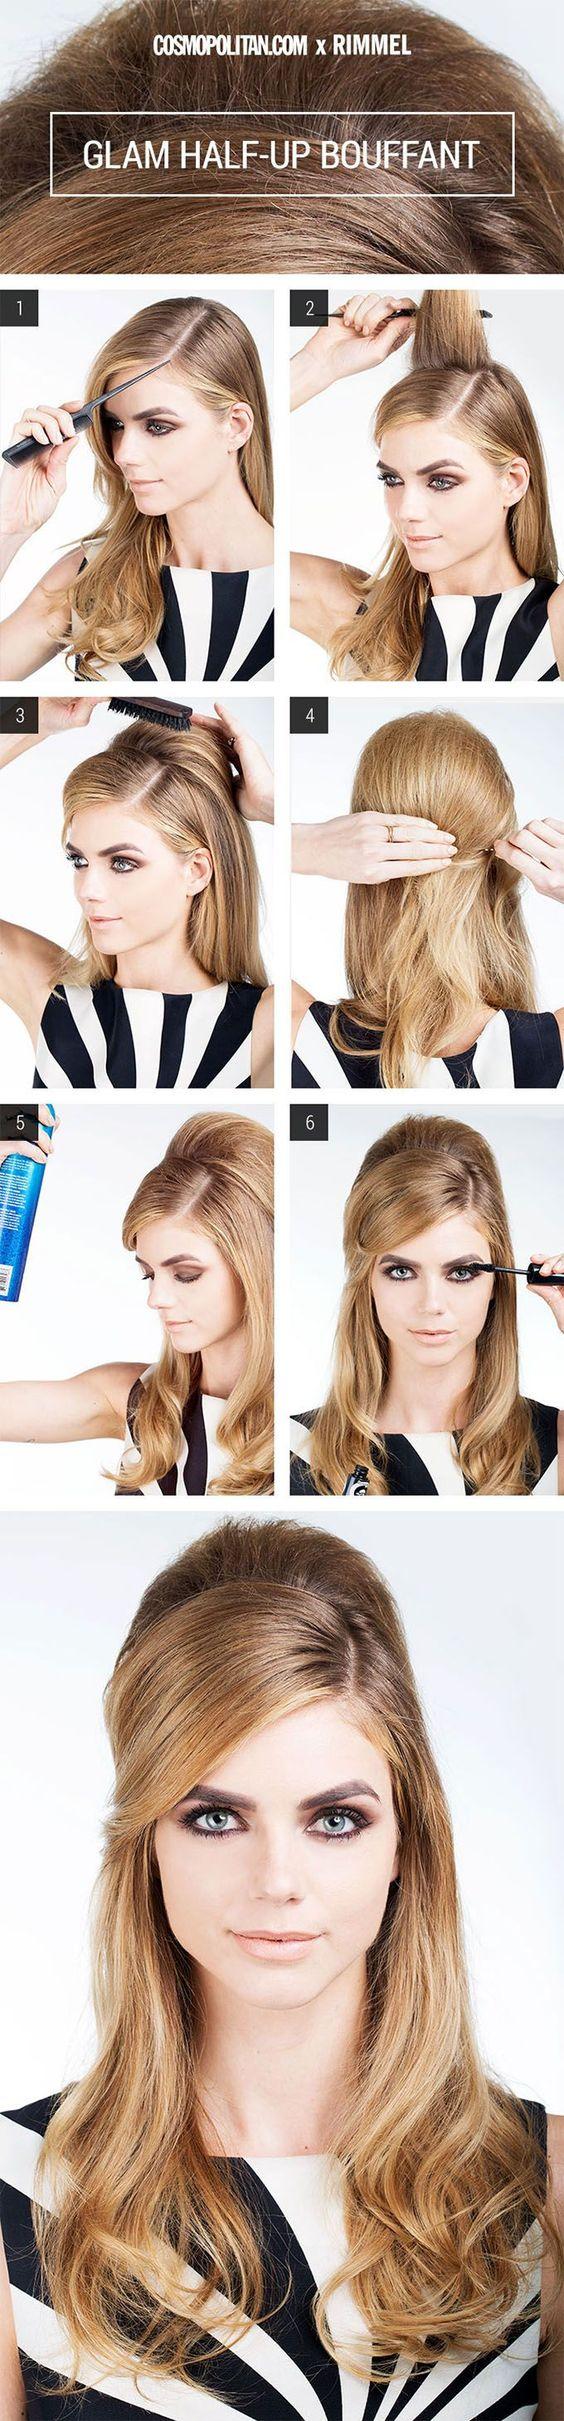 Halloween Hair - 27 DIY hair tutorials - Hair Romance